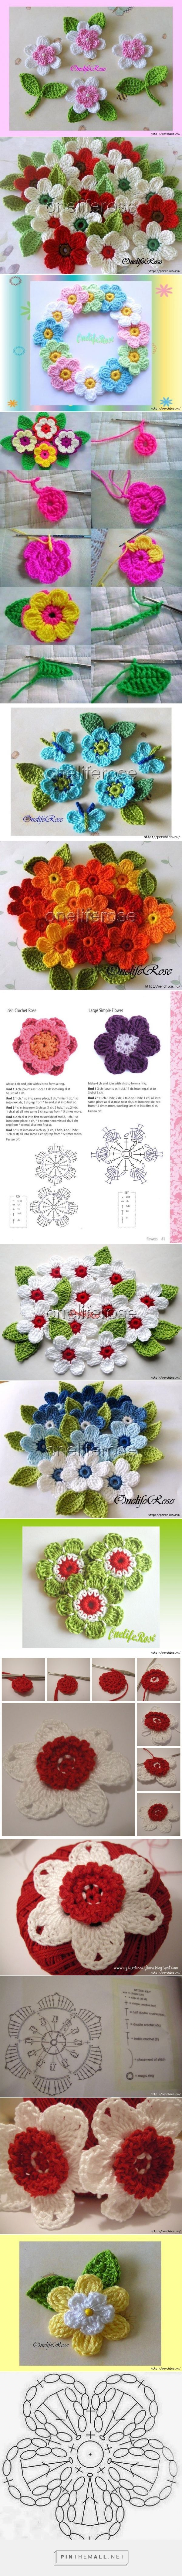 Pin by su rider on crochet pinterest create crochet and pin by su rider on crochet pinterest create crochet and crochet flowers bankloansurffo Images